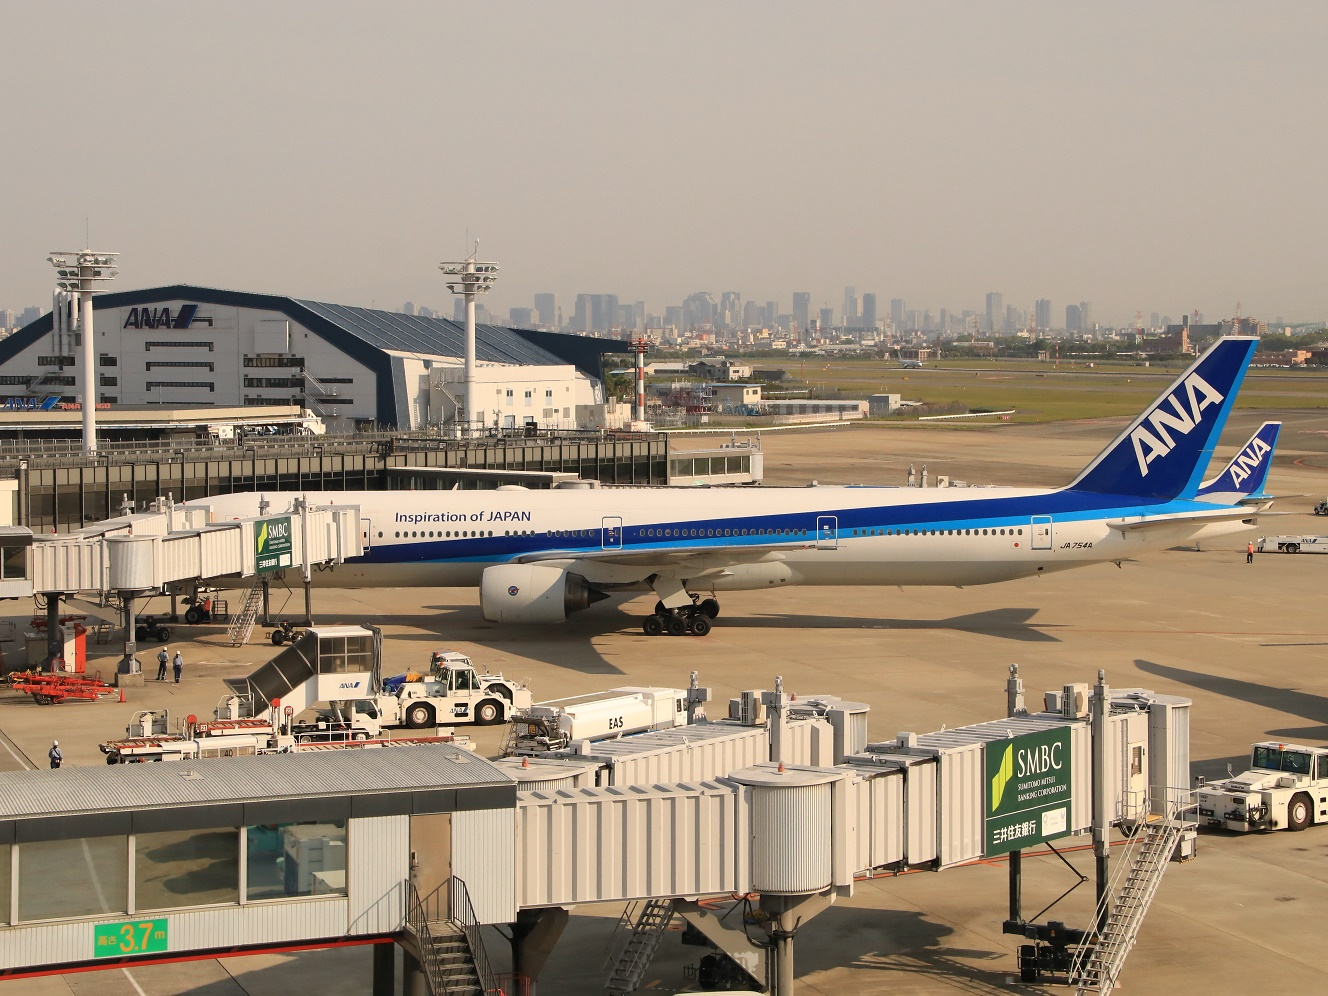 ANA ボーイング777-300 伊丹空港_d0202264_19145556.jpg